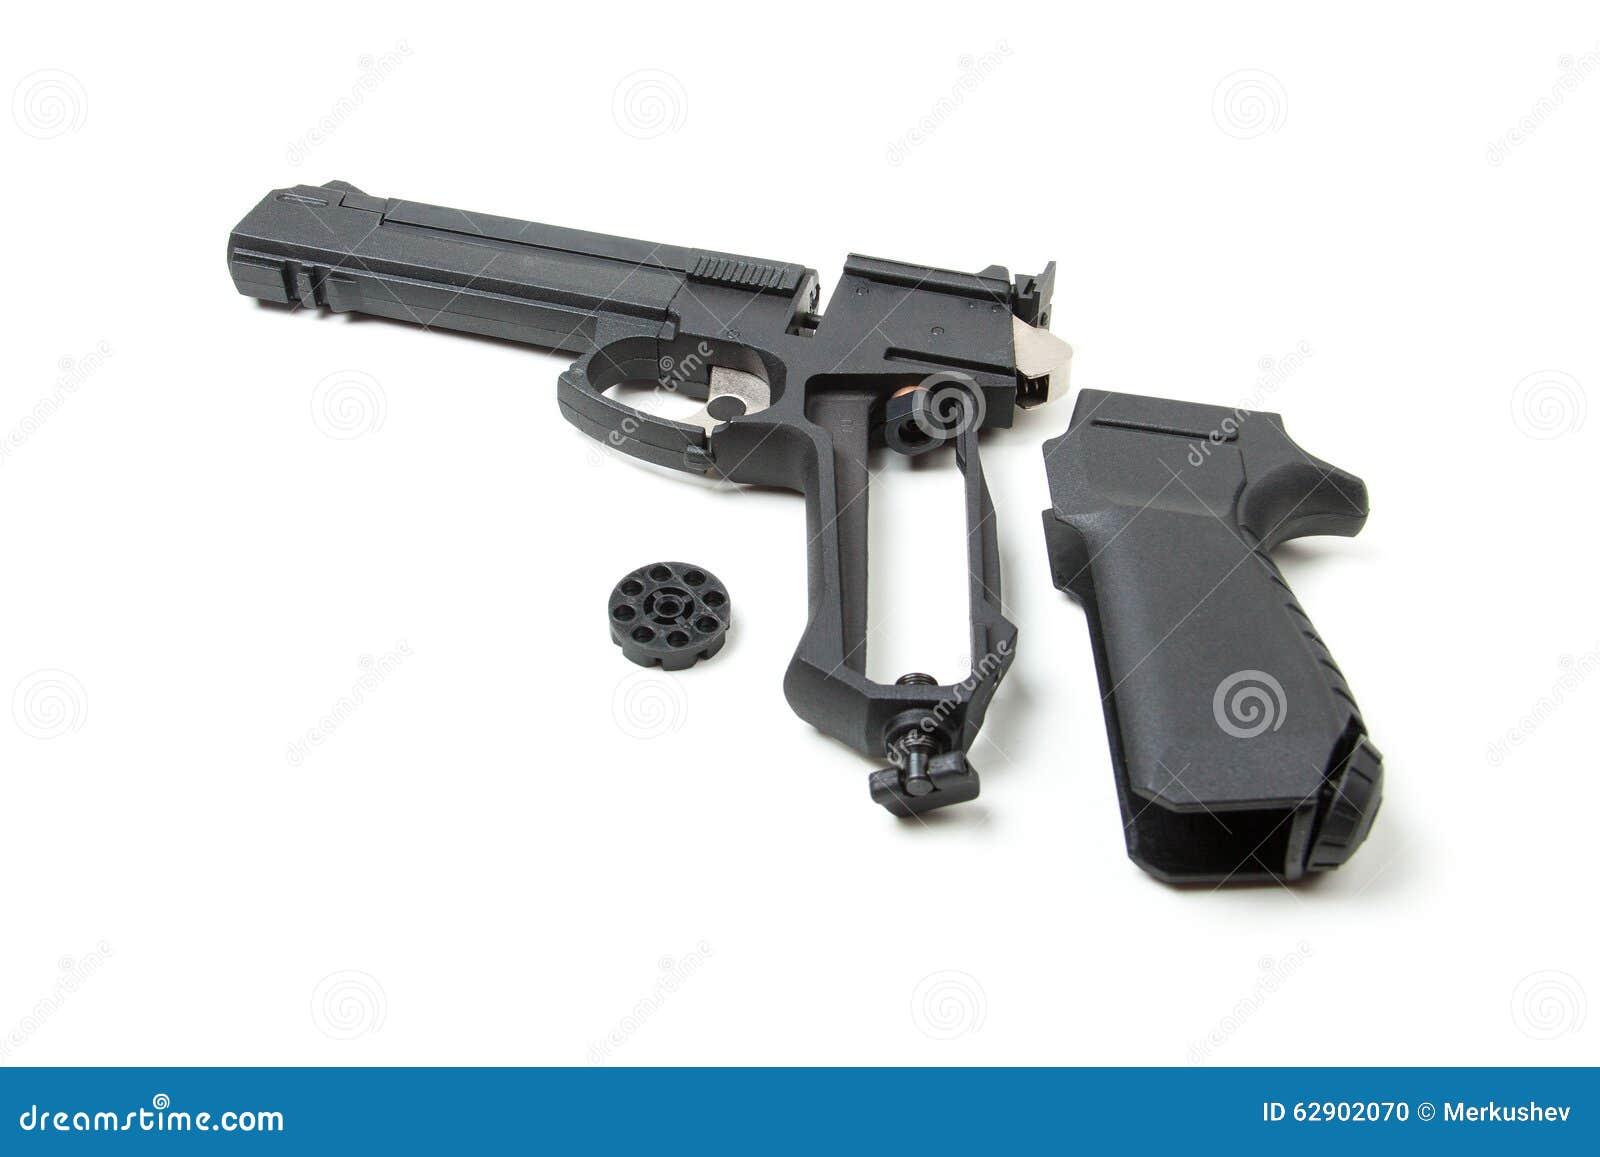 gun white background - photo #42